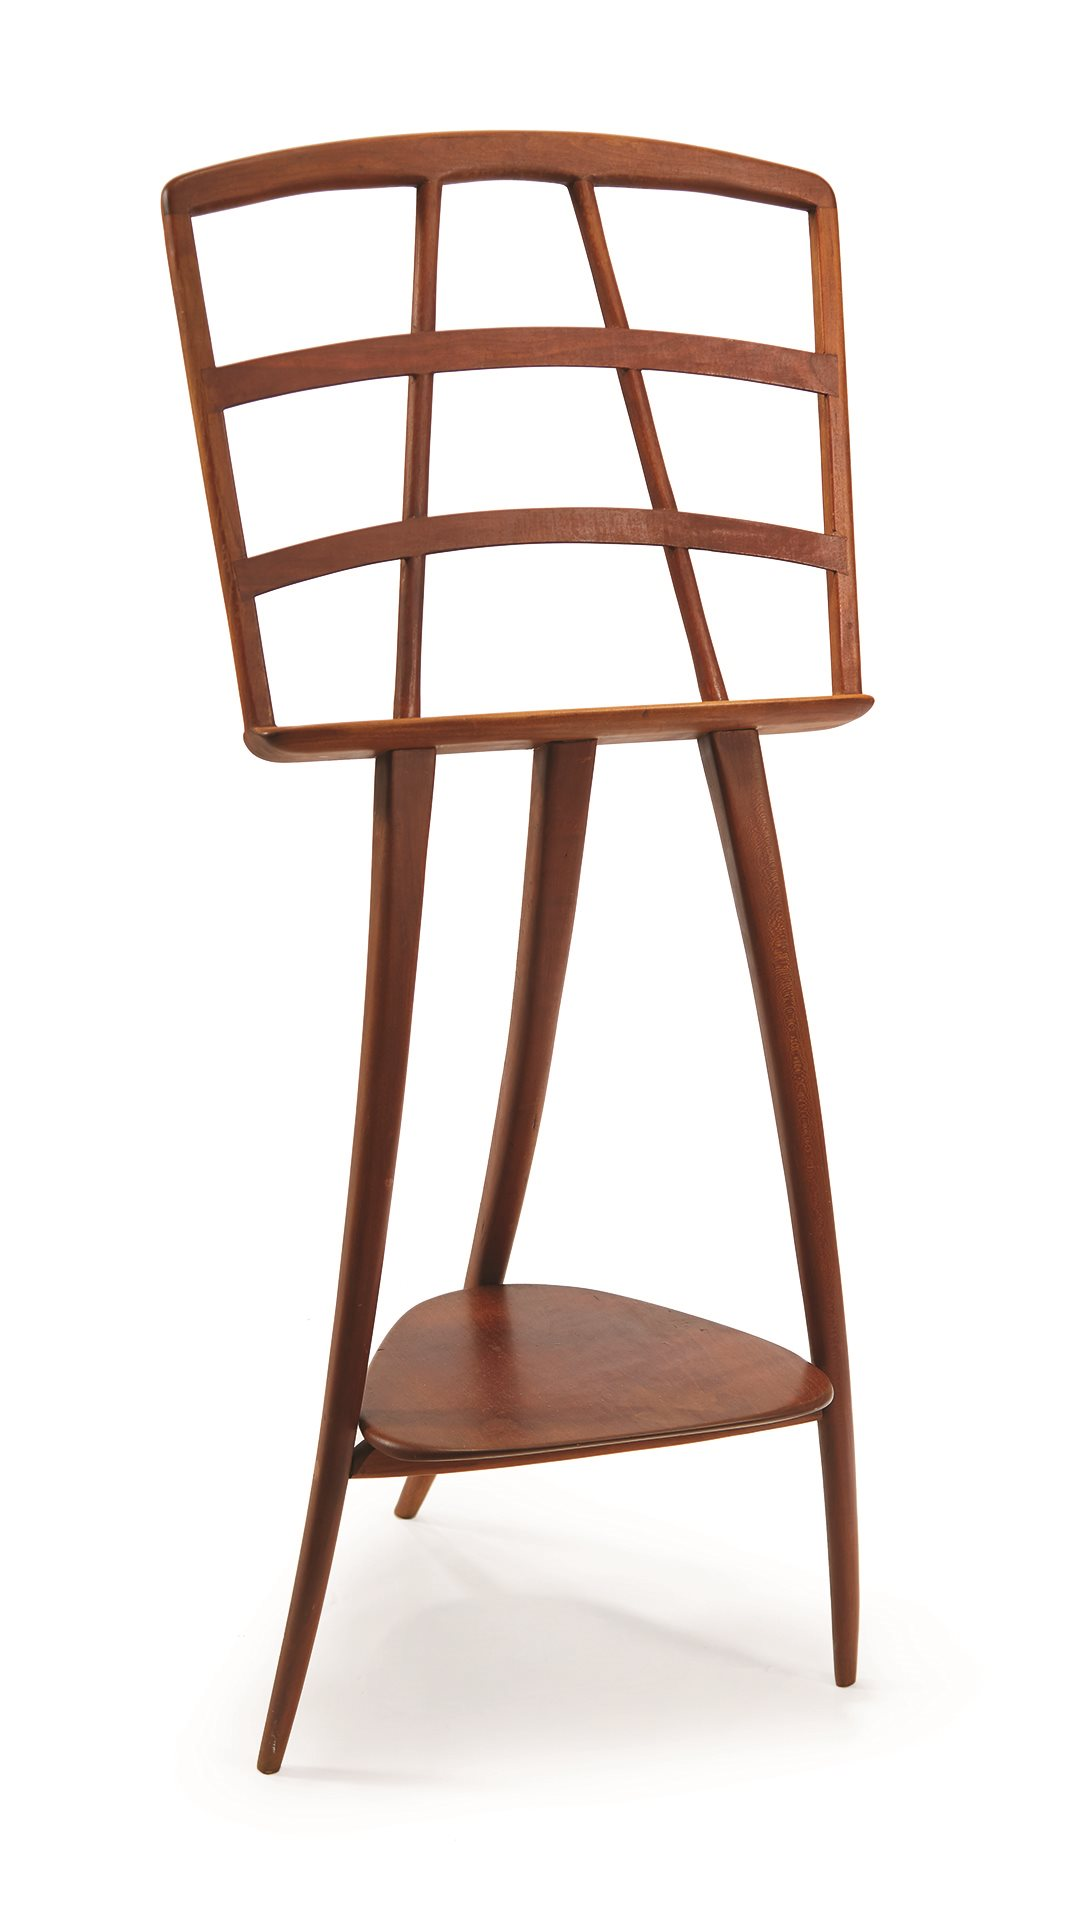 Wharton Esherick (American, 1887-1970)  Music Stand, Paoli, Pennsylvania, 1962, $20,000-30,000